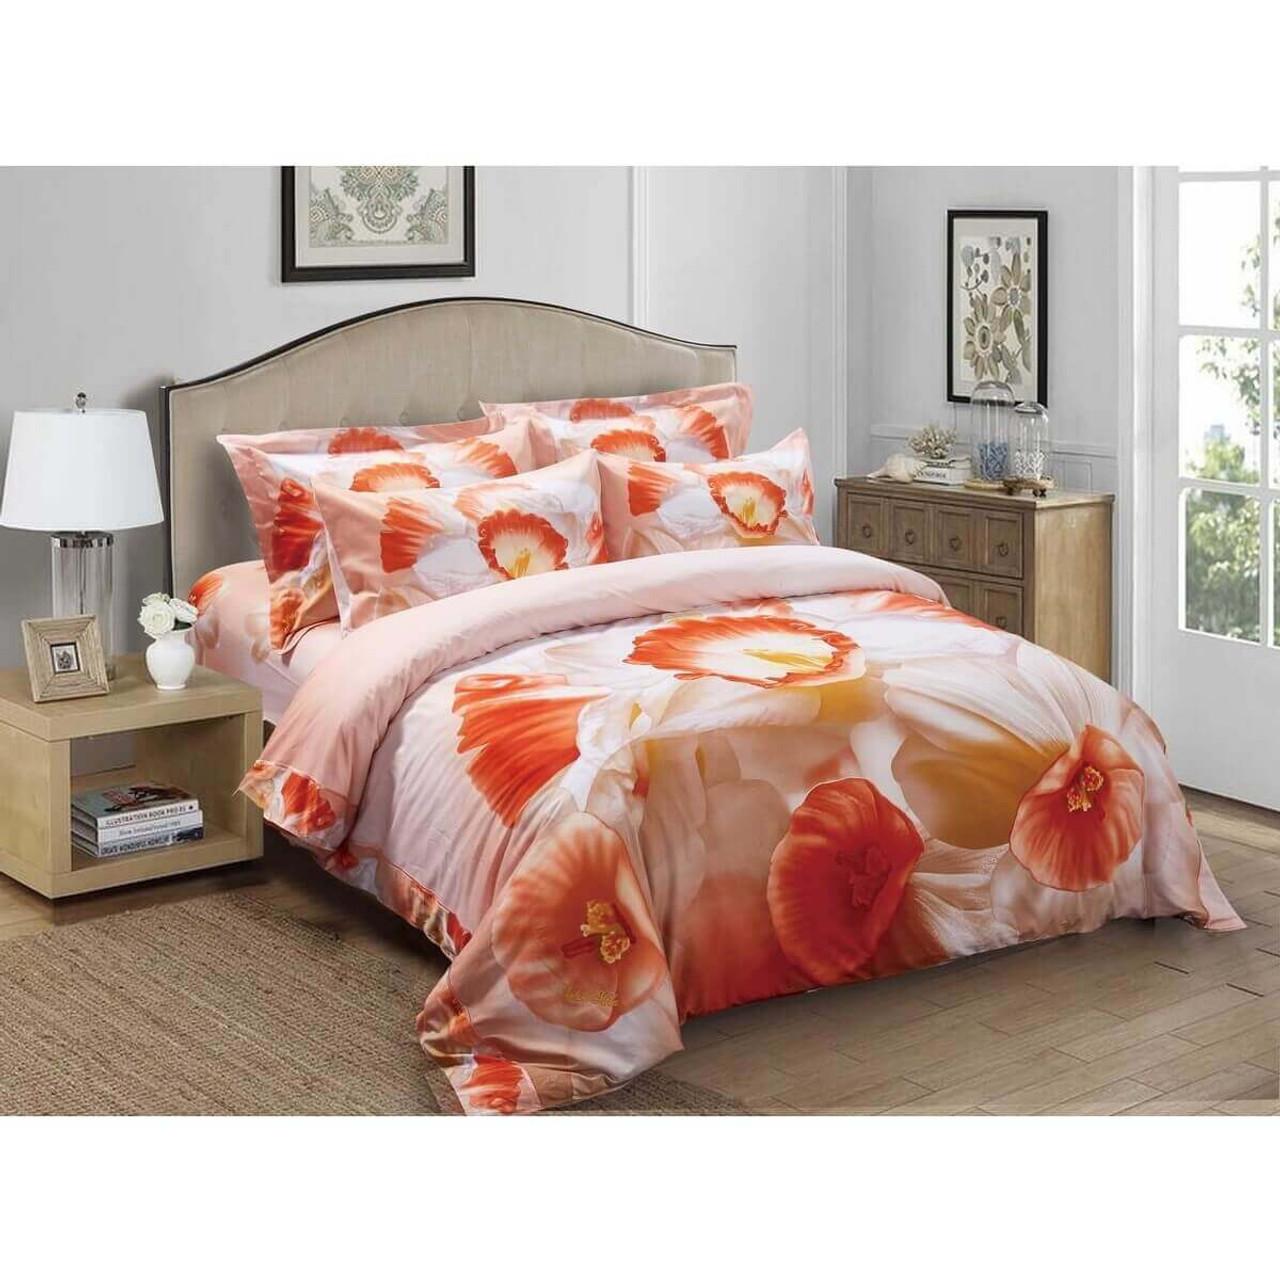 8171460146064 Floral Bedding, Dolce Mela DM702Q Drop-shipping